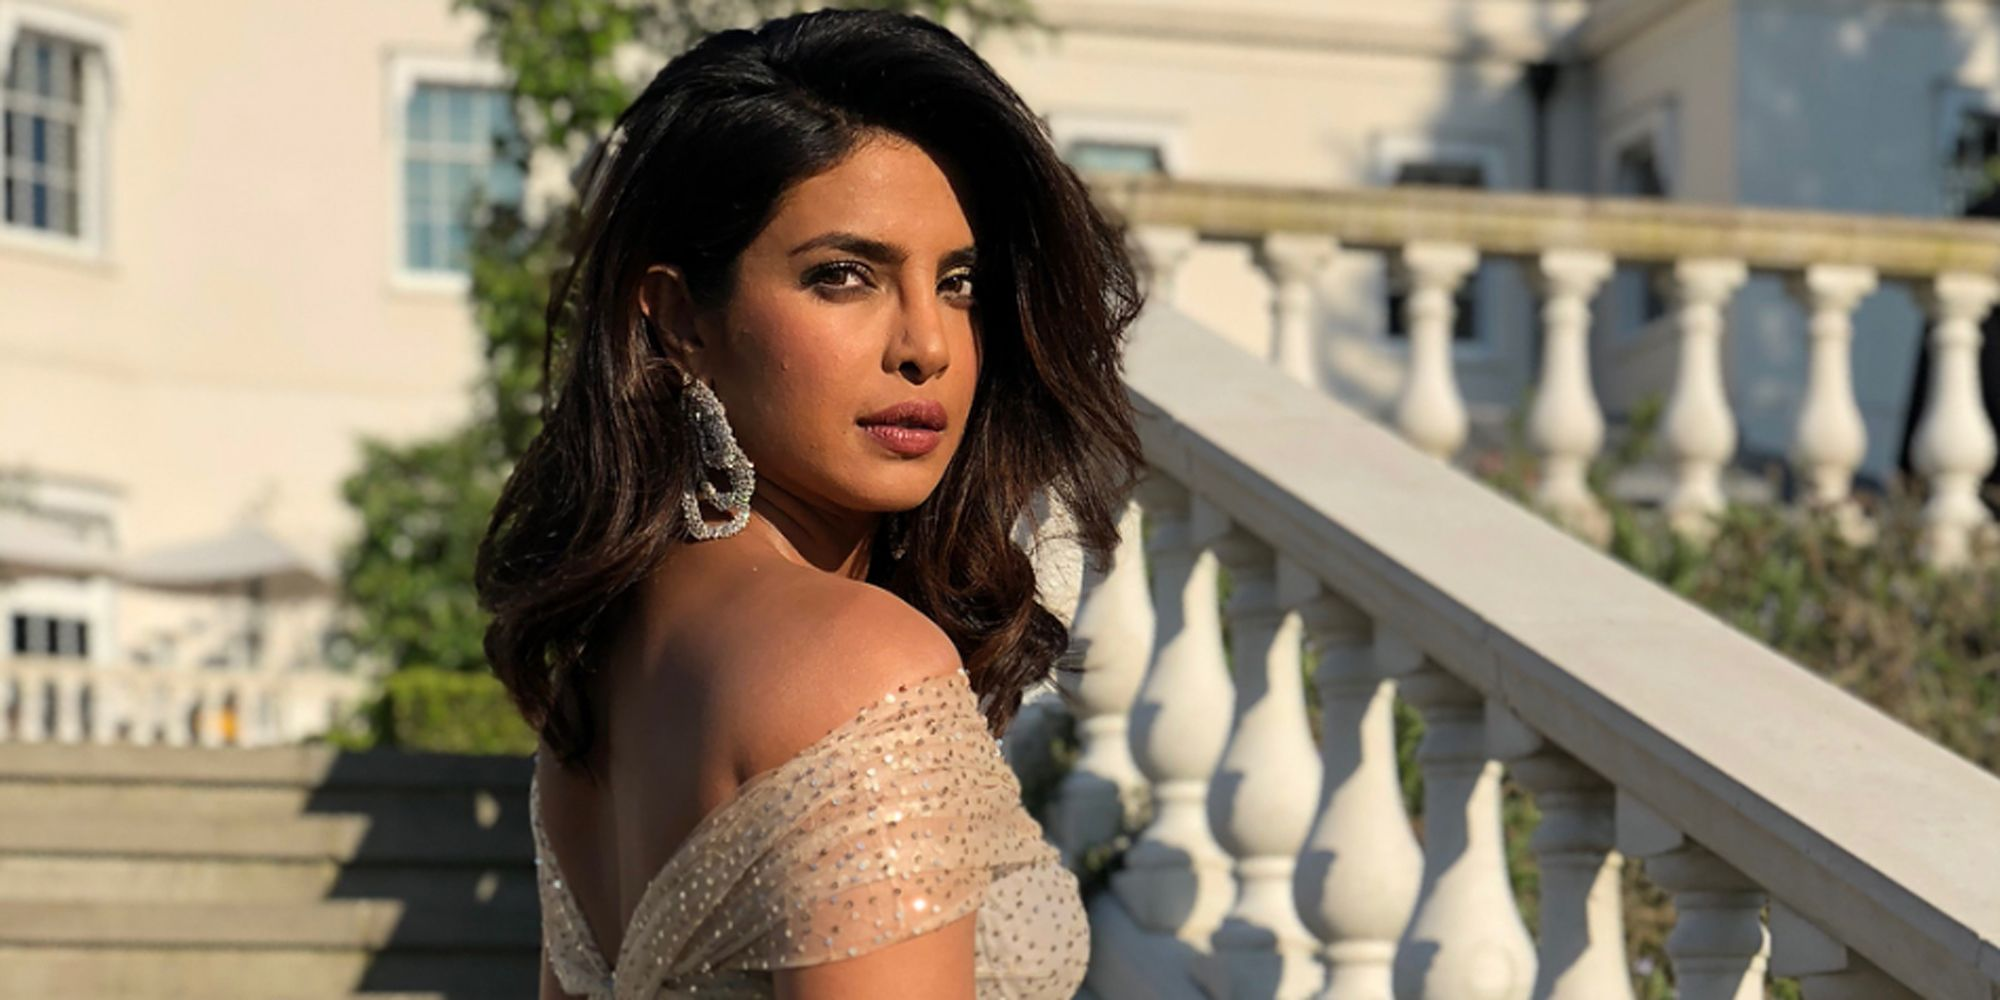 5c0435f72251 Priyanka Chopra Wears Dior Princess Dress for Meghan Markle and Prince  Harry s Reception - Priyanka Royal Wedding Outfit Change